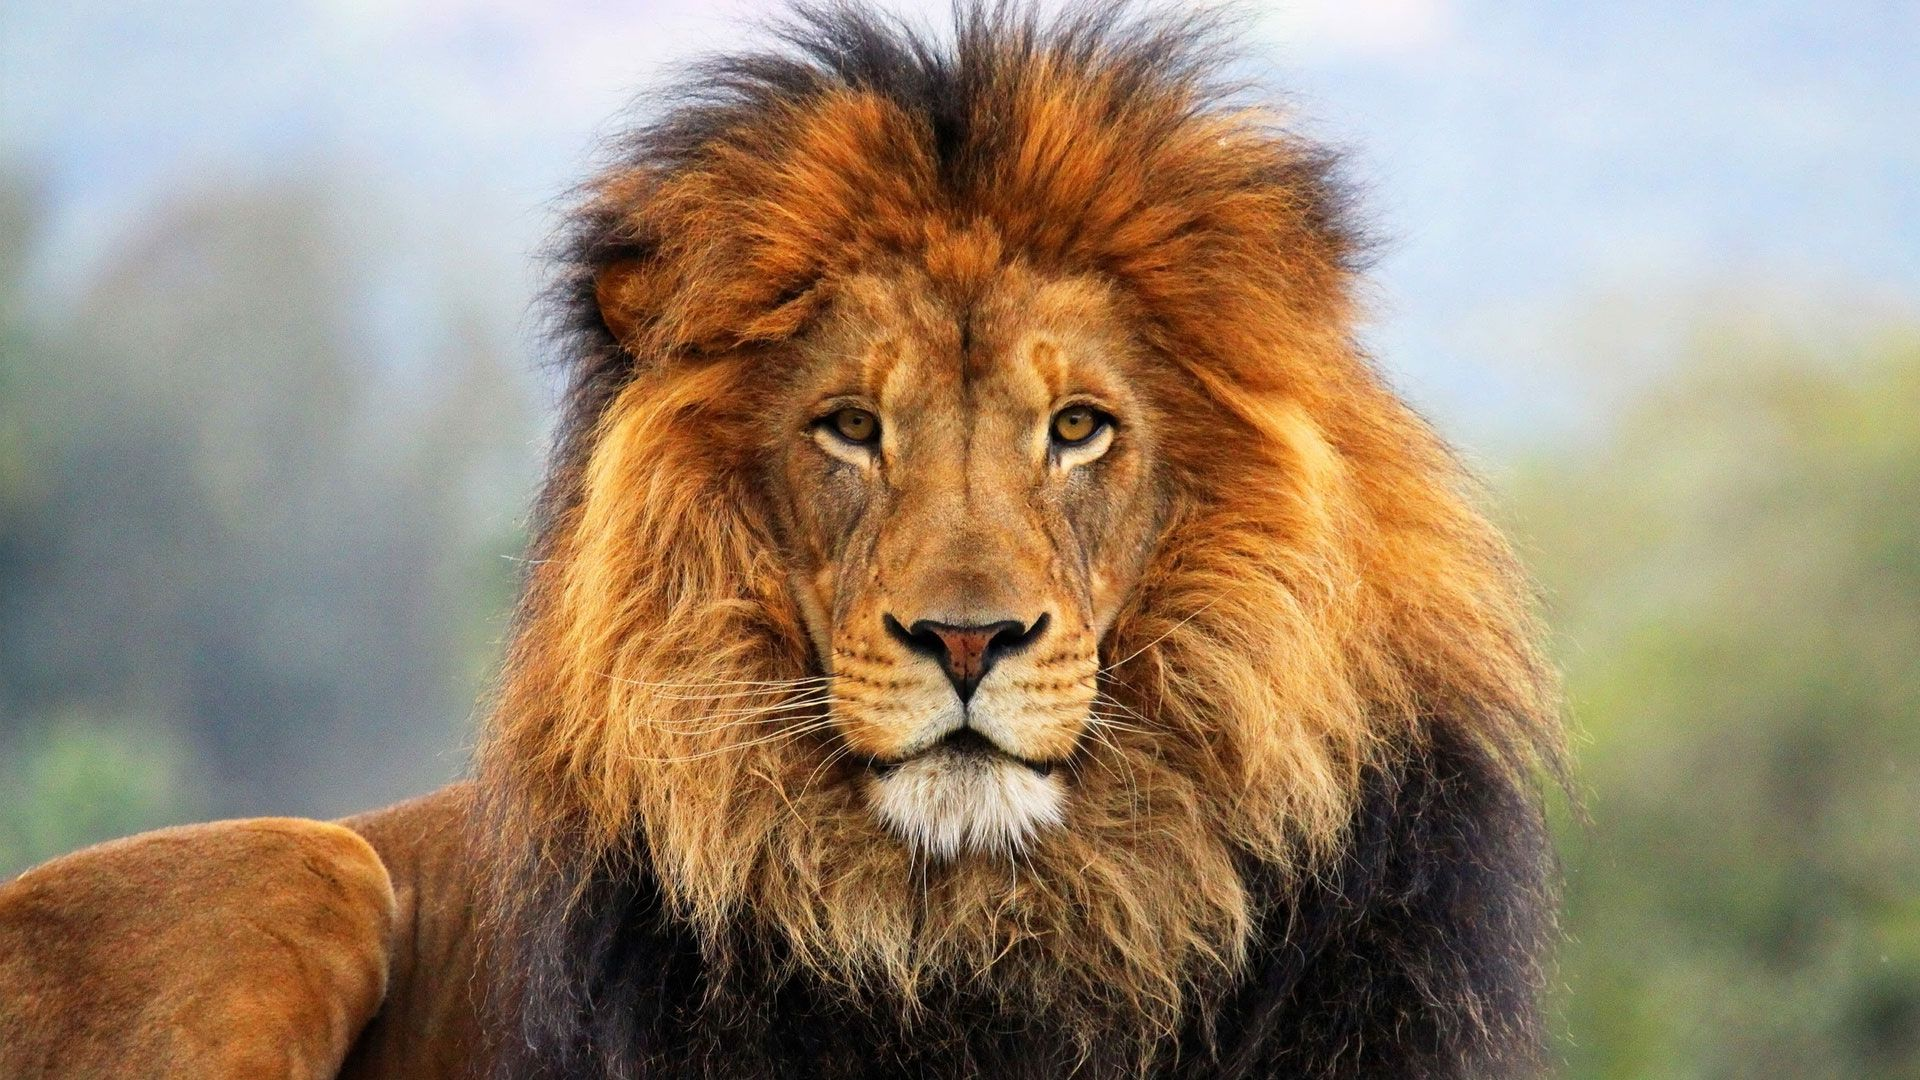 Lion Wallpaper Hd 1080p Free Large Images Lion Pictures Lion Hd Wallpaper Animals